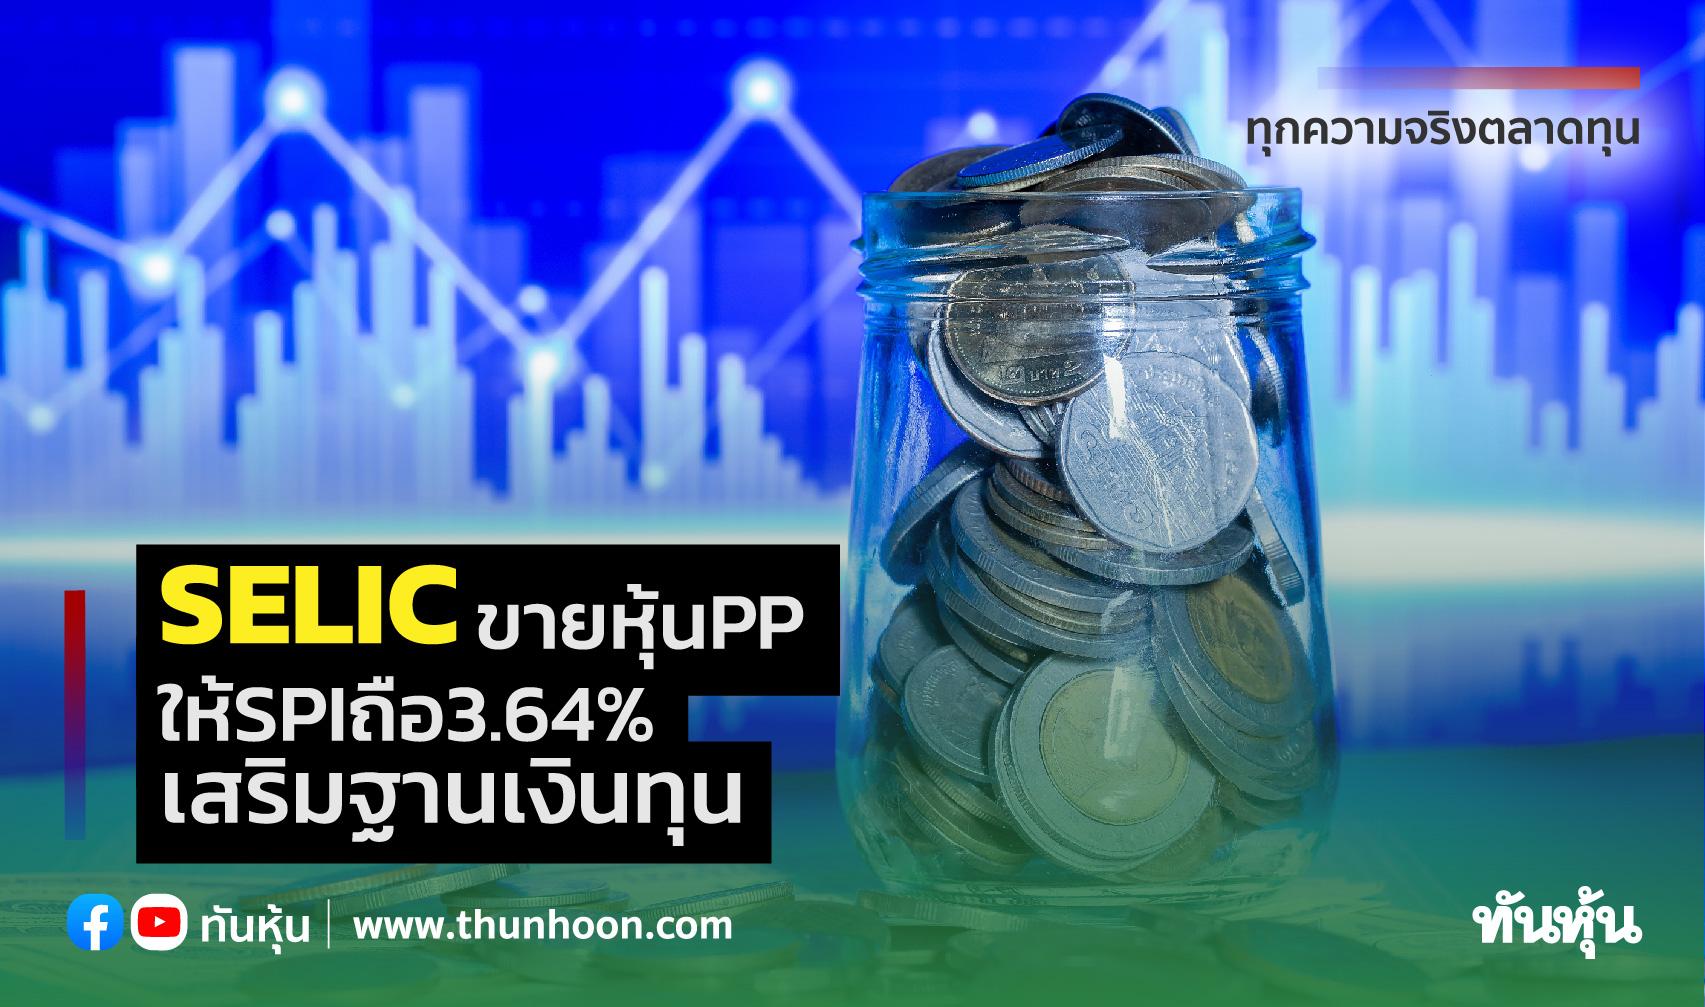 SELICขายหุ้นPP ให้SPIถือ3.64% เสริมฐานเงินทุน